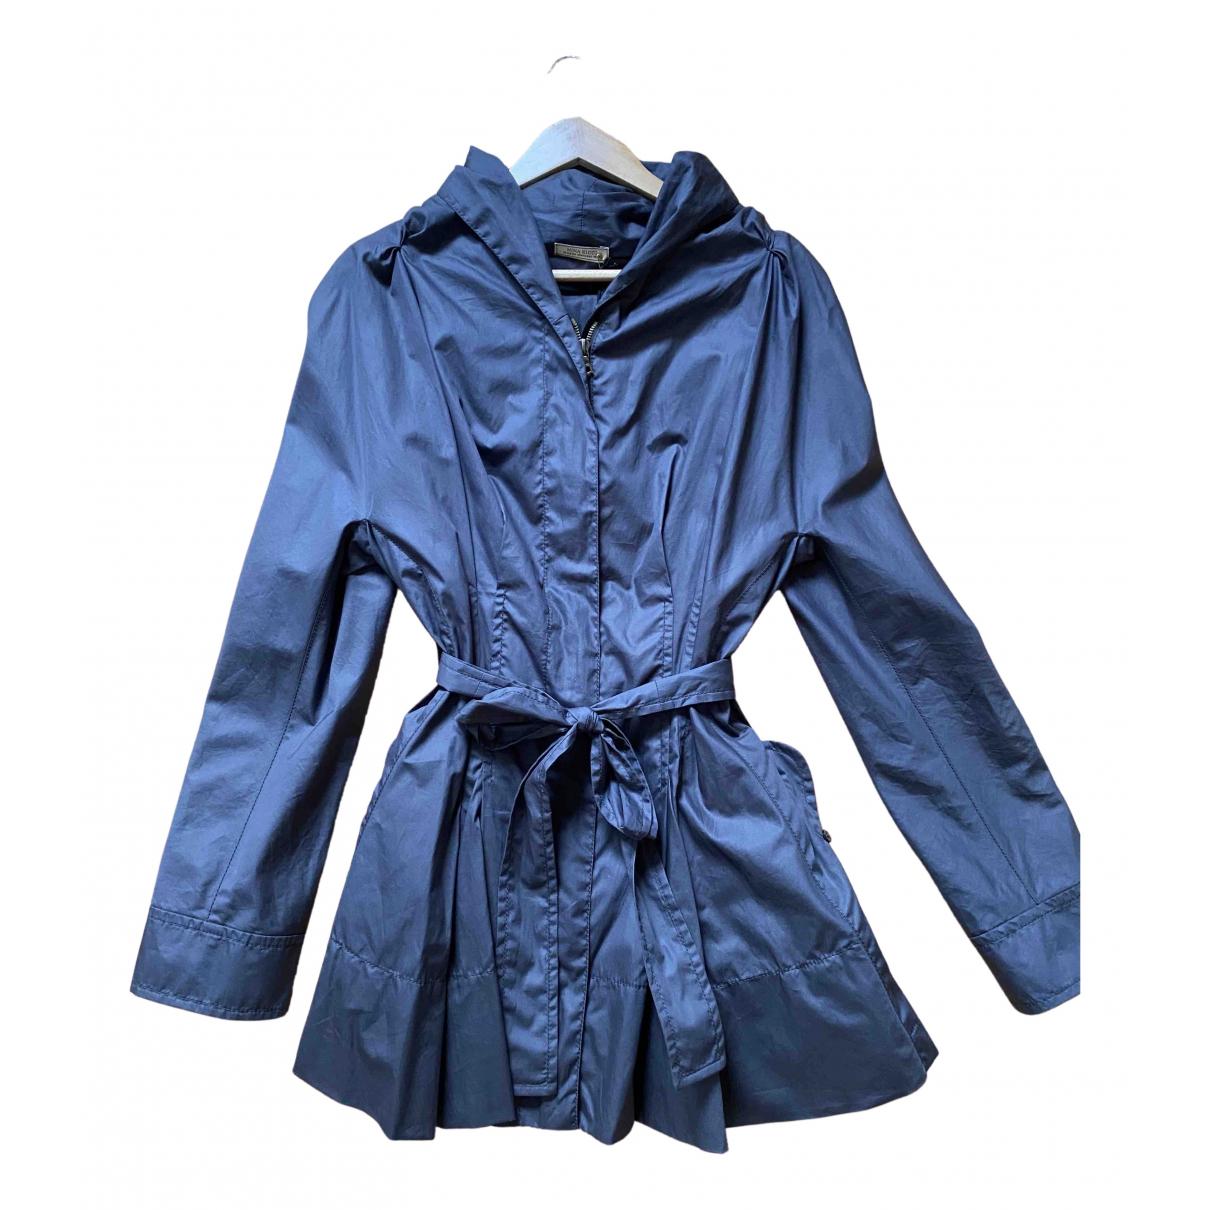 Nina Ricci N Grey Cotton Trench coat for Women 38 FR